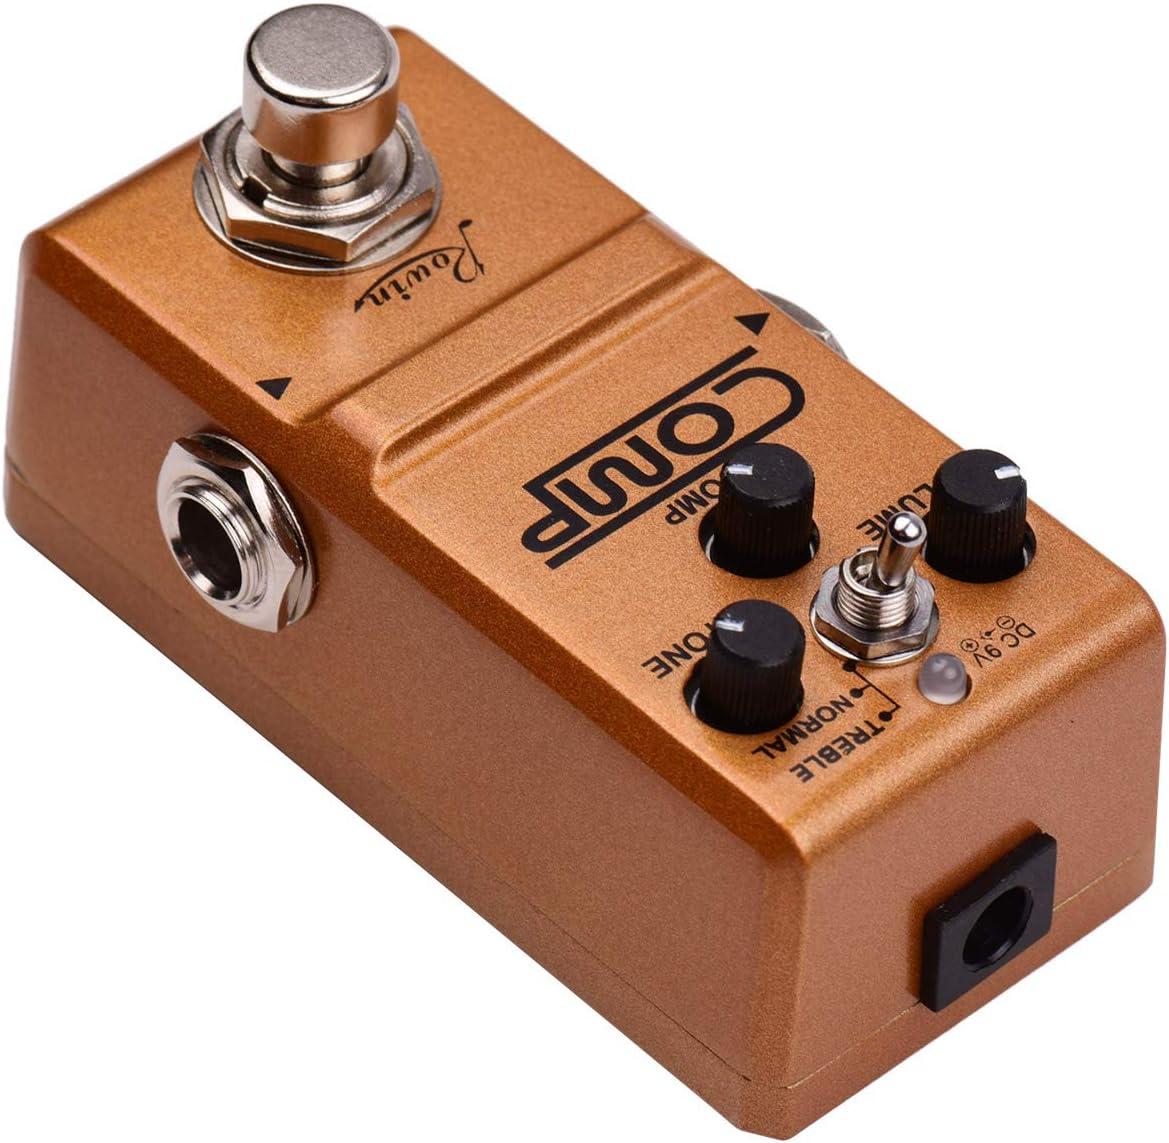 Bedler pedal de guitarra Compresor Pedal de guitarra Pedal de efectos True Bypass